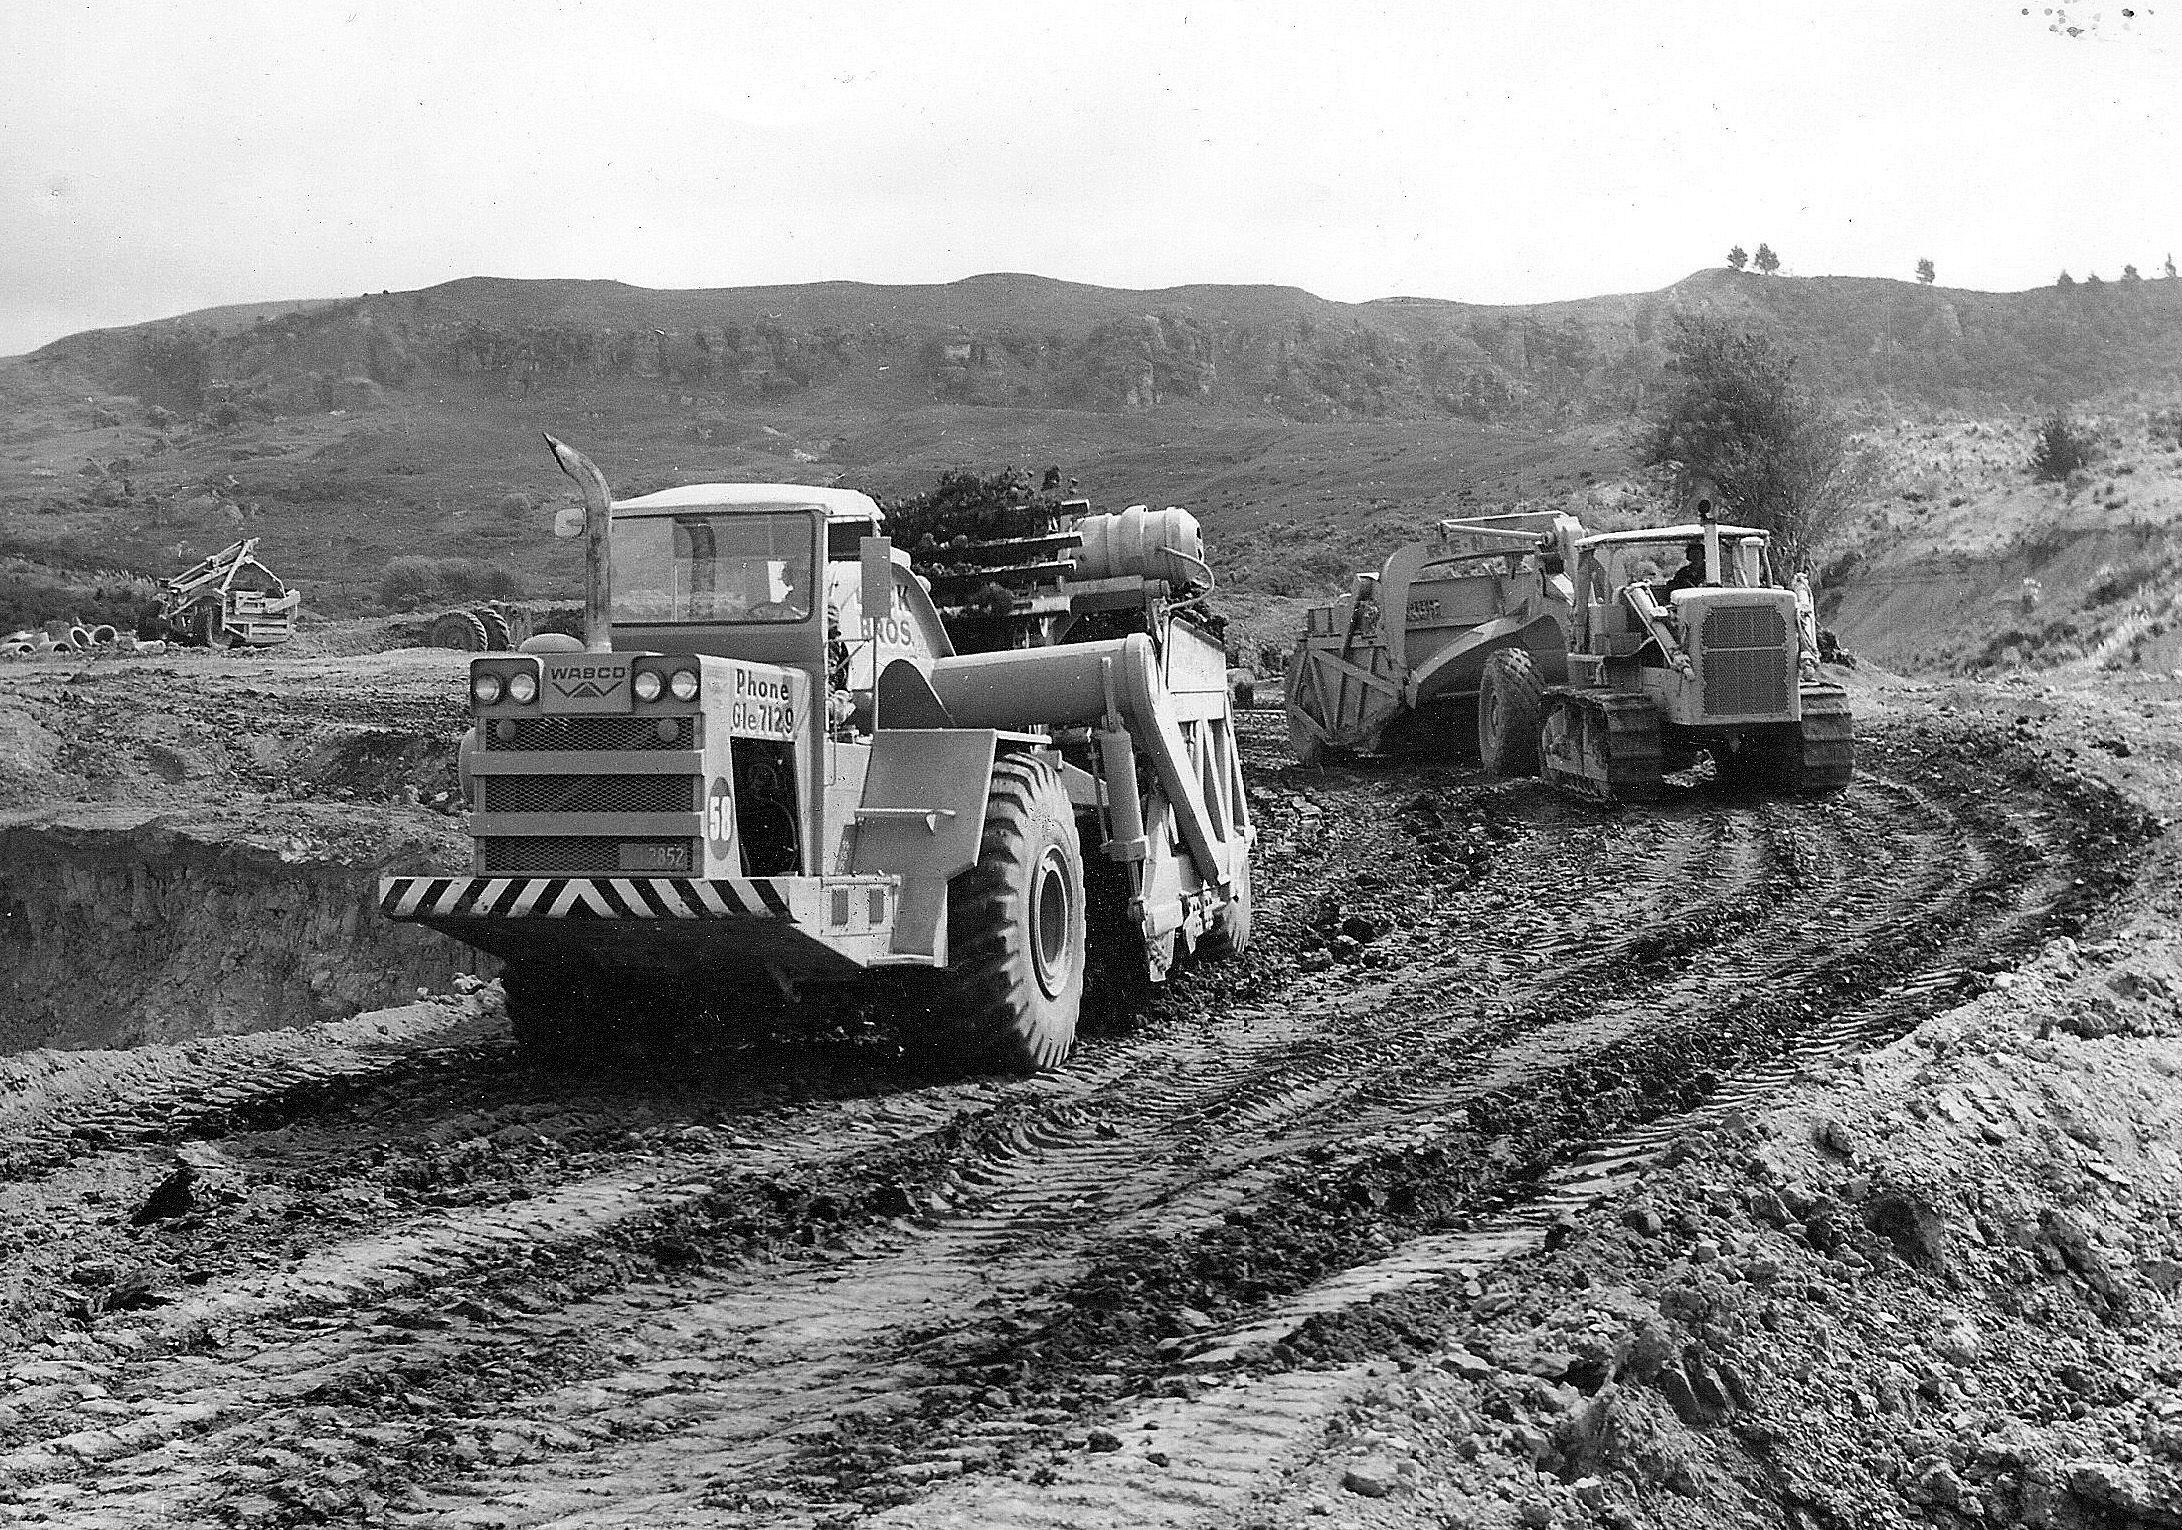 Classic Machines: The Wabco 222 elevating scraper | Proud To